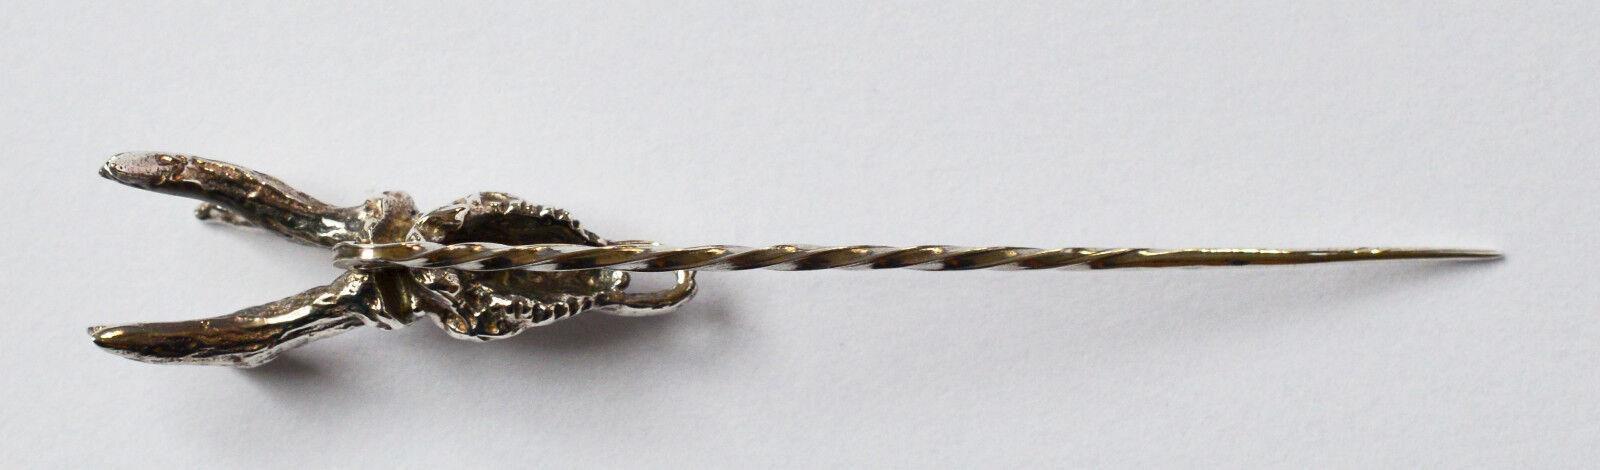 Cravatte Cravatte Cravatte ago Spilla argentoo 800 cranio Hirsch per lavoro manuale 1900 cm 6 fdc6df